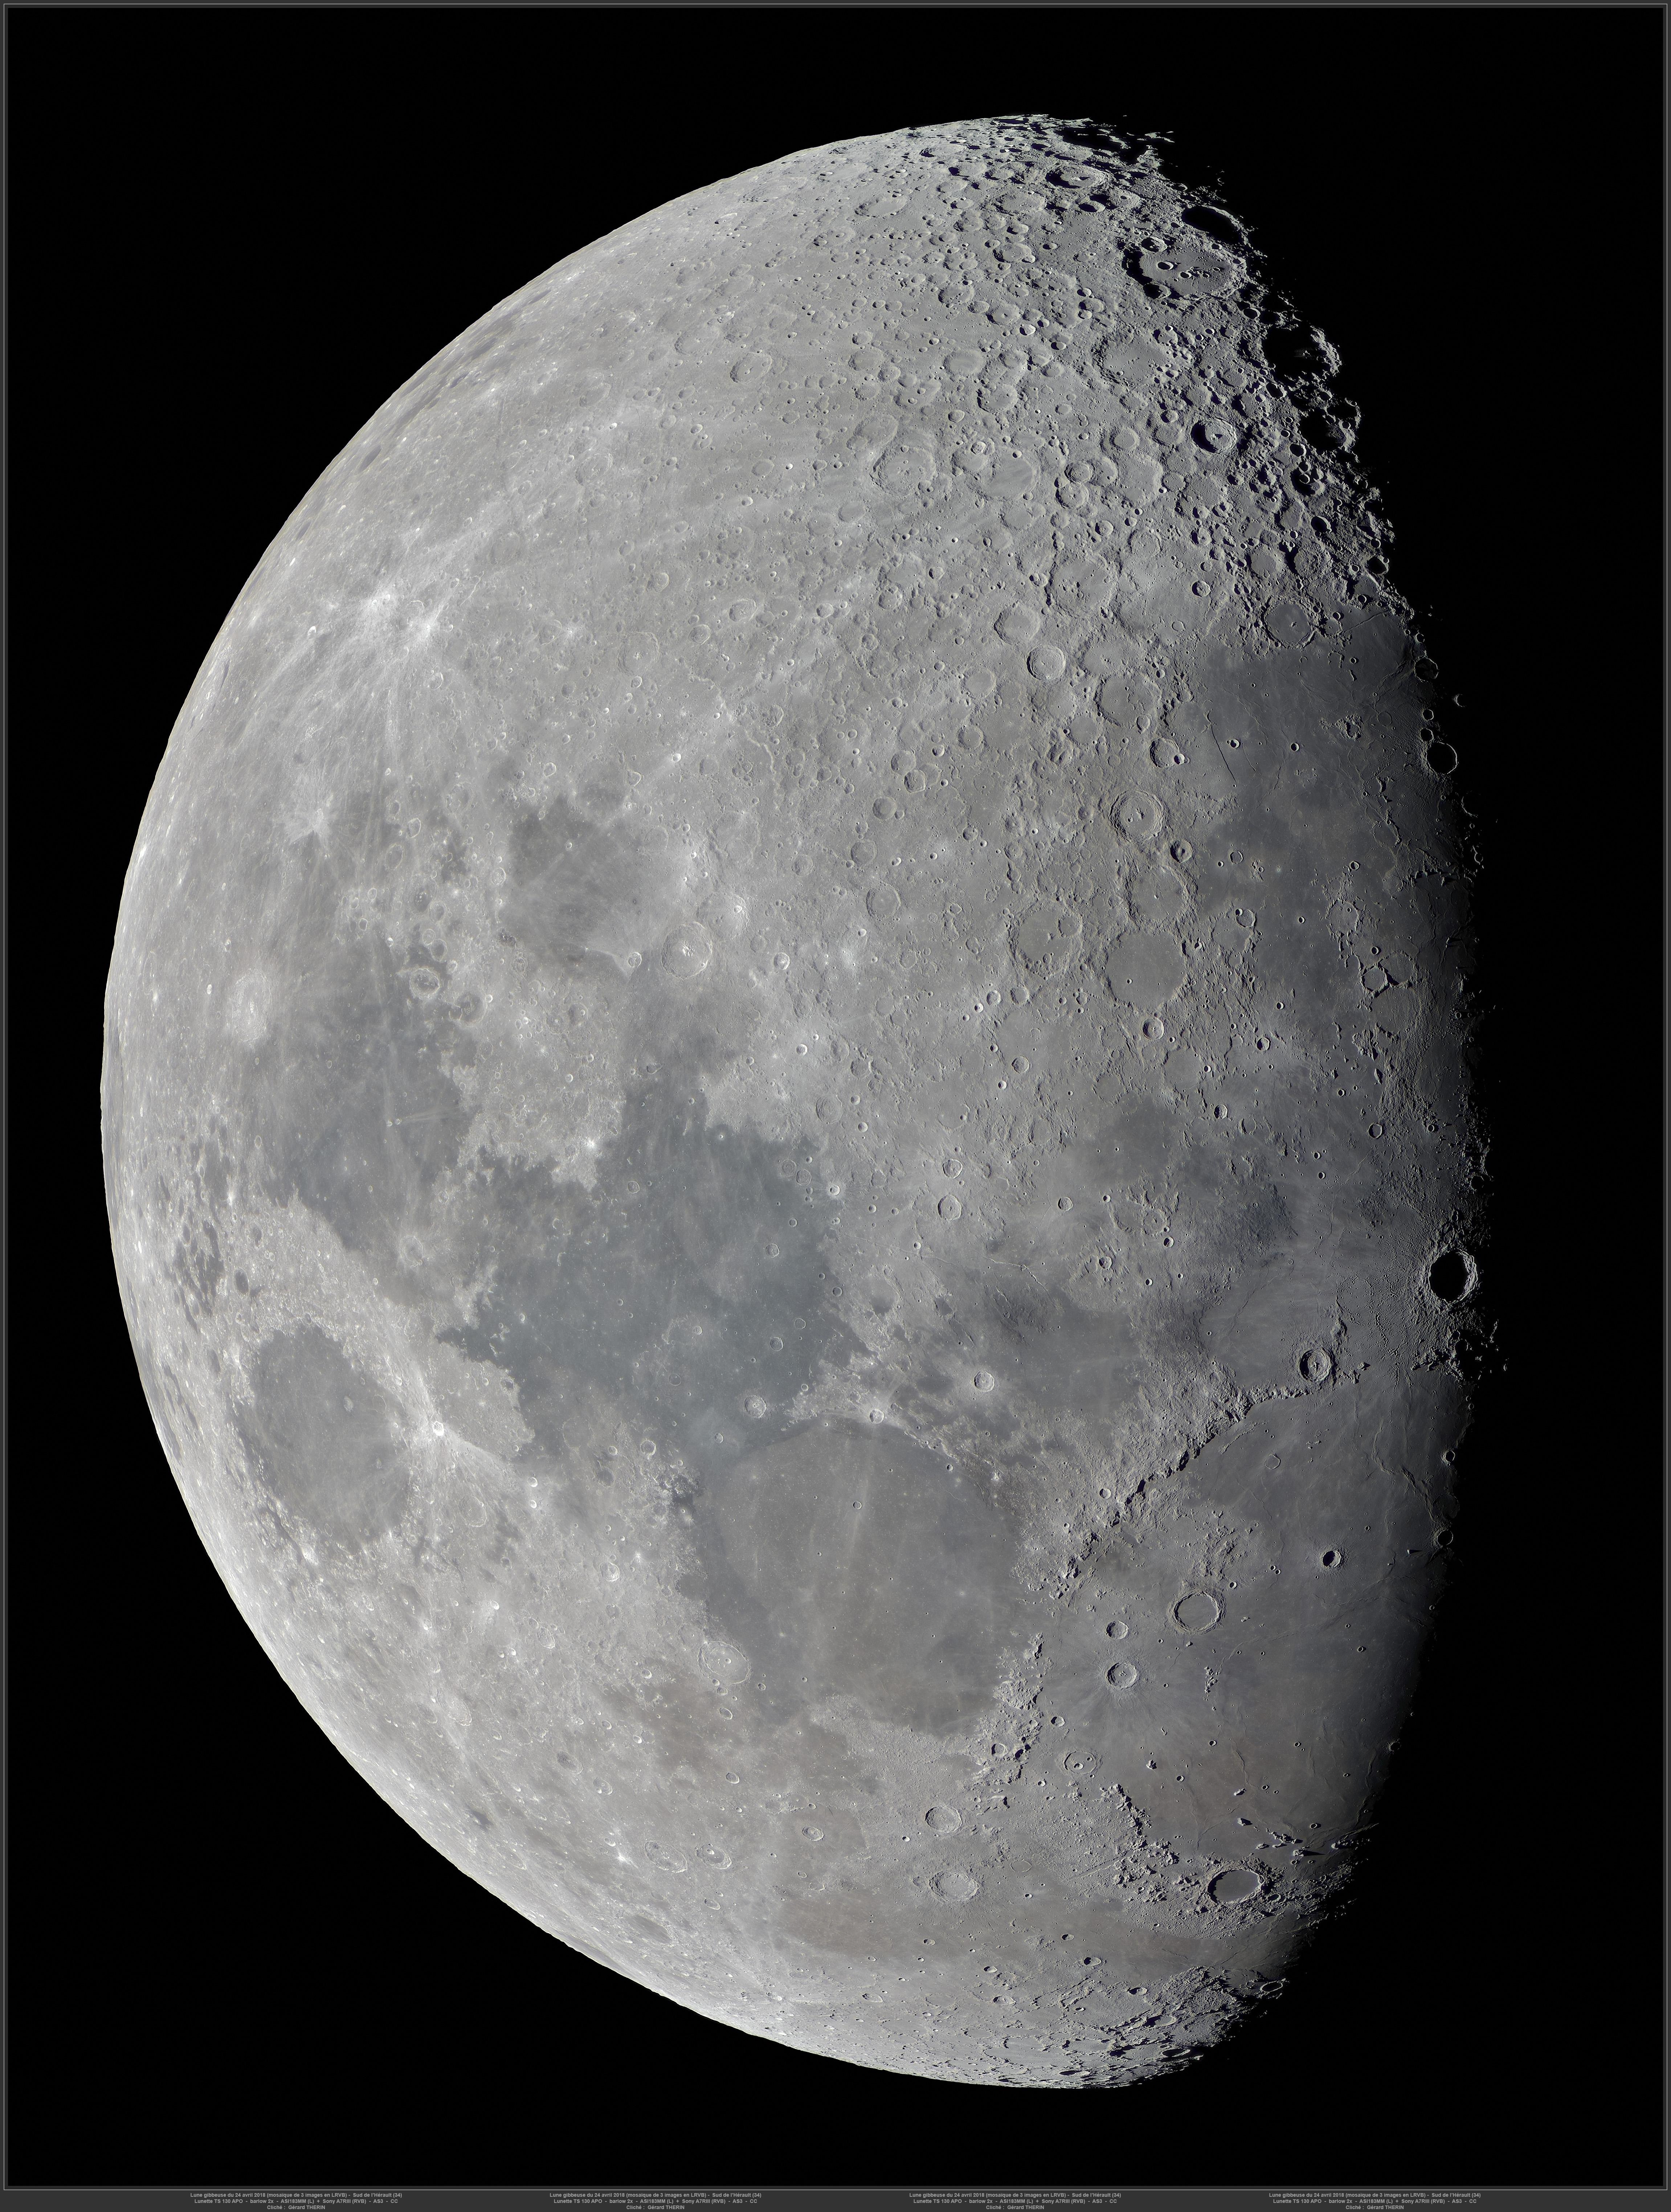 2018_04_24_lune_gibbeuse_lrvb_ts130_2x_a